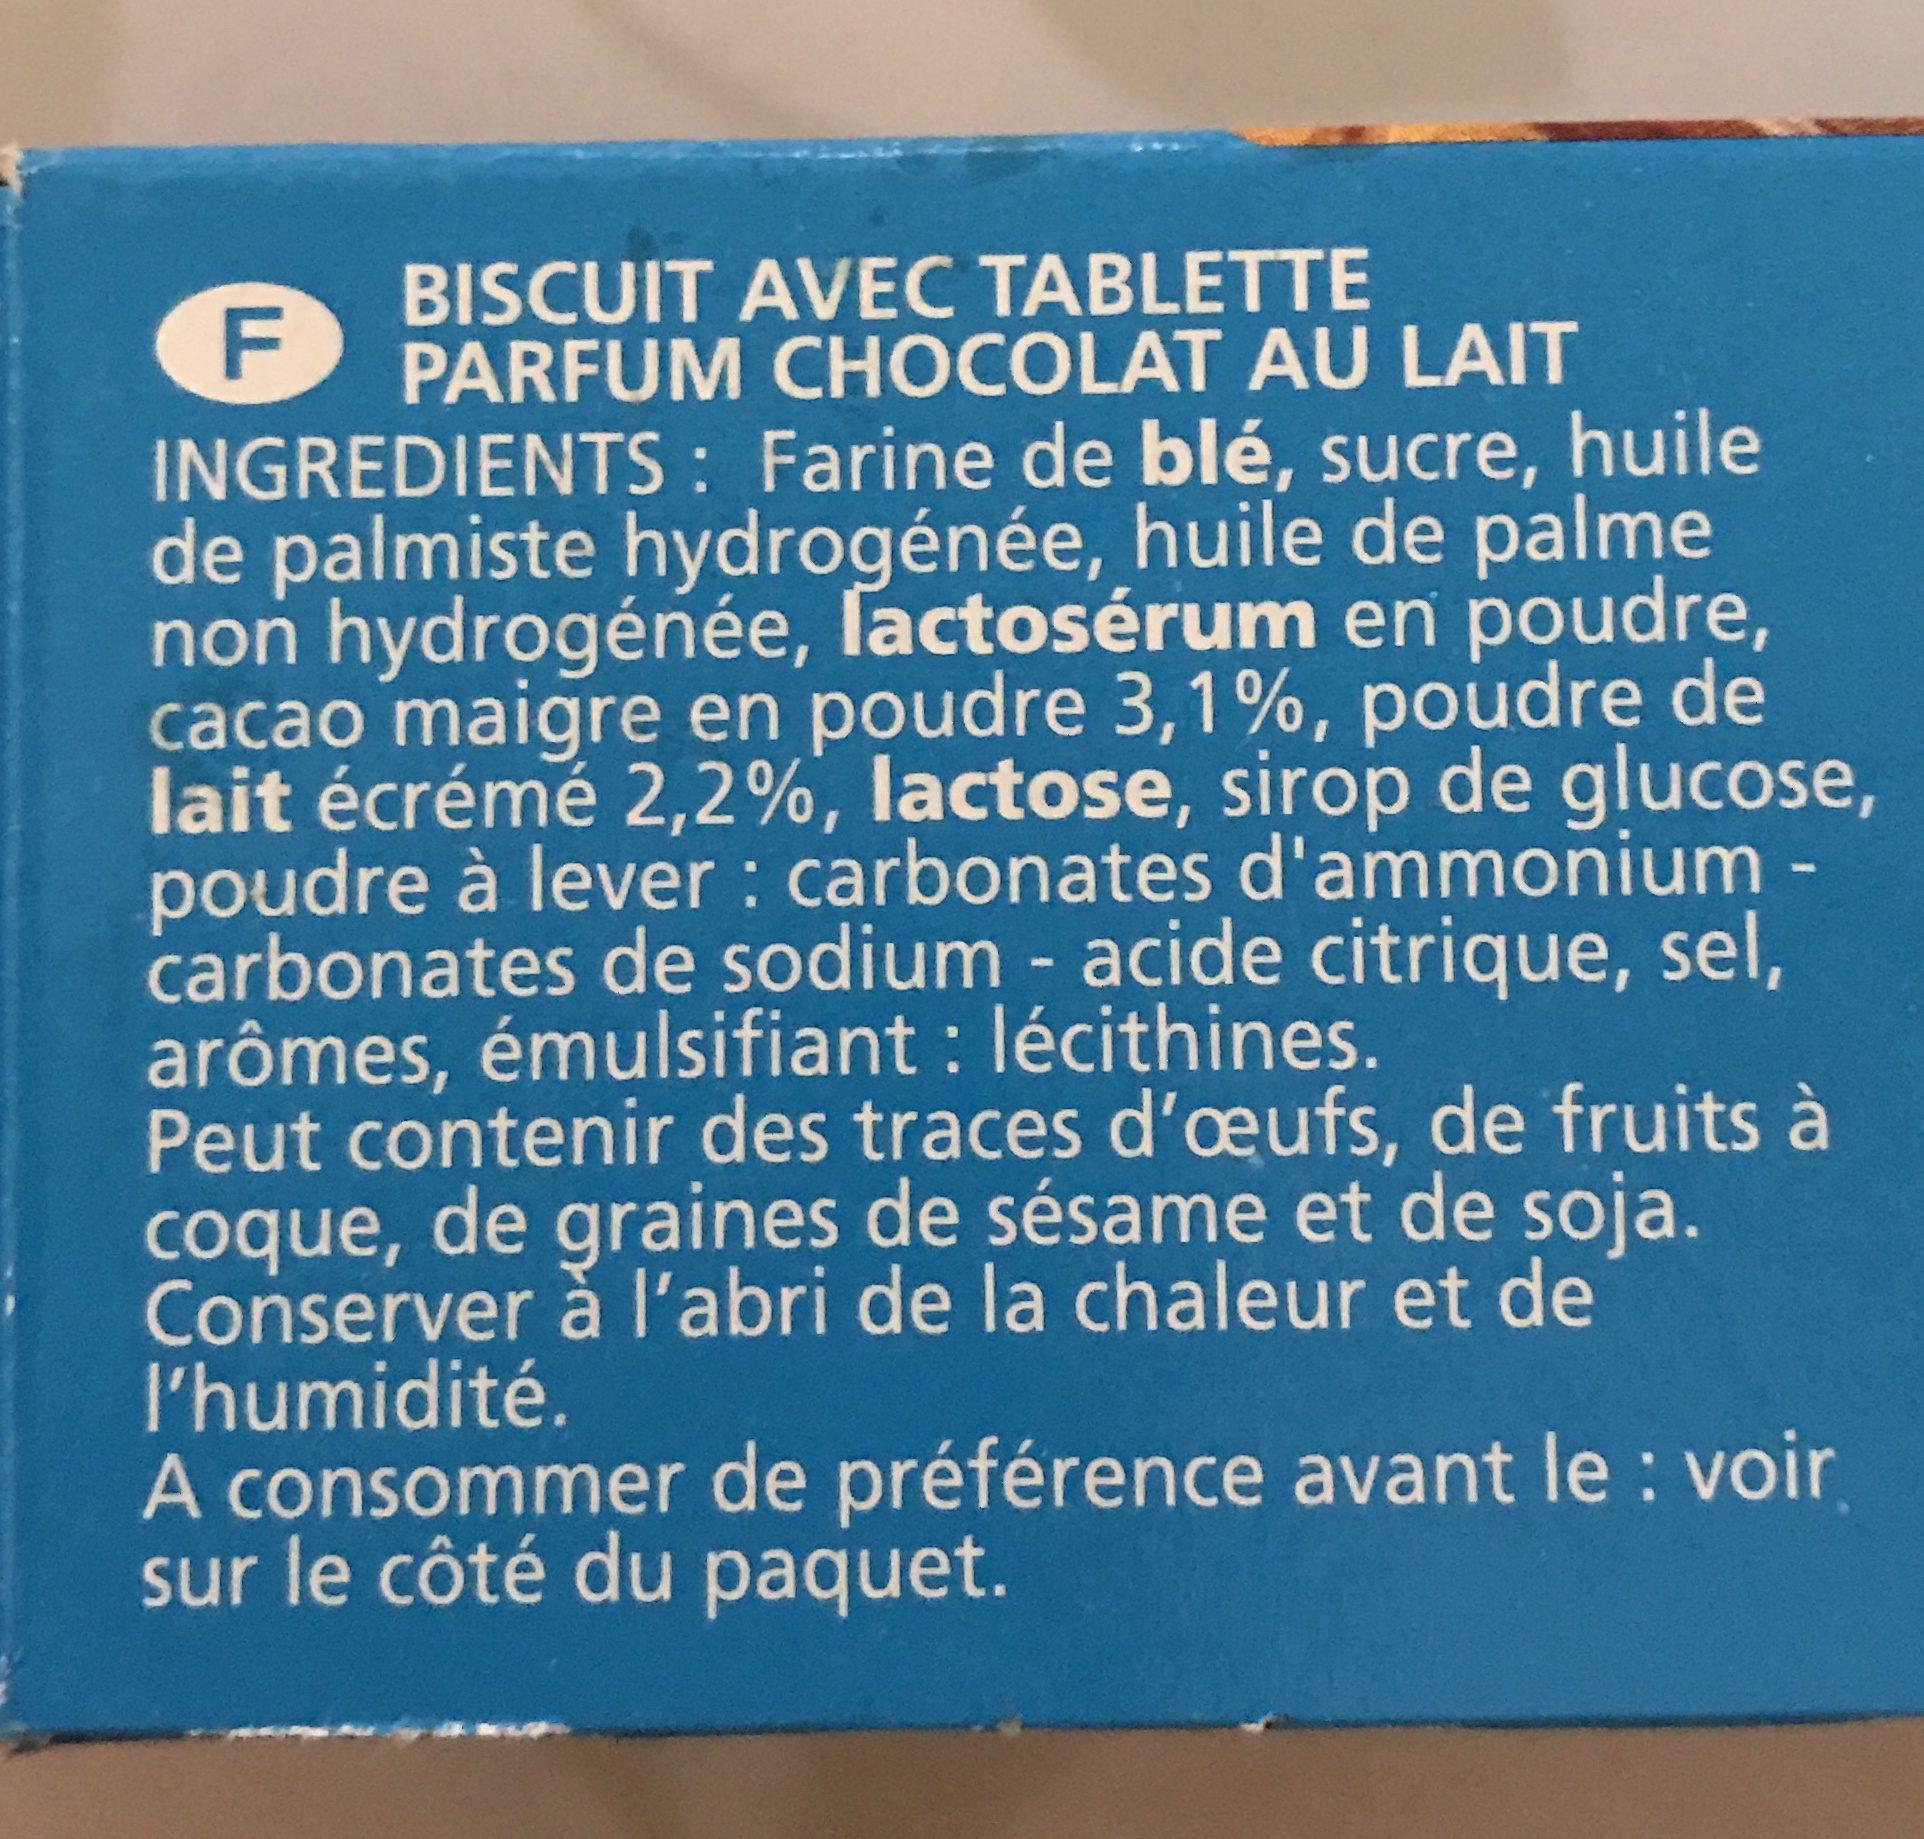 Biscuit avec tablette parfum chocolat - Ingrediënten - fr